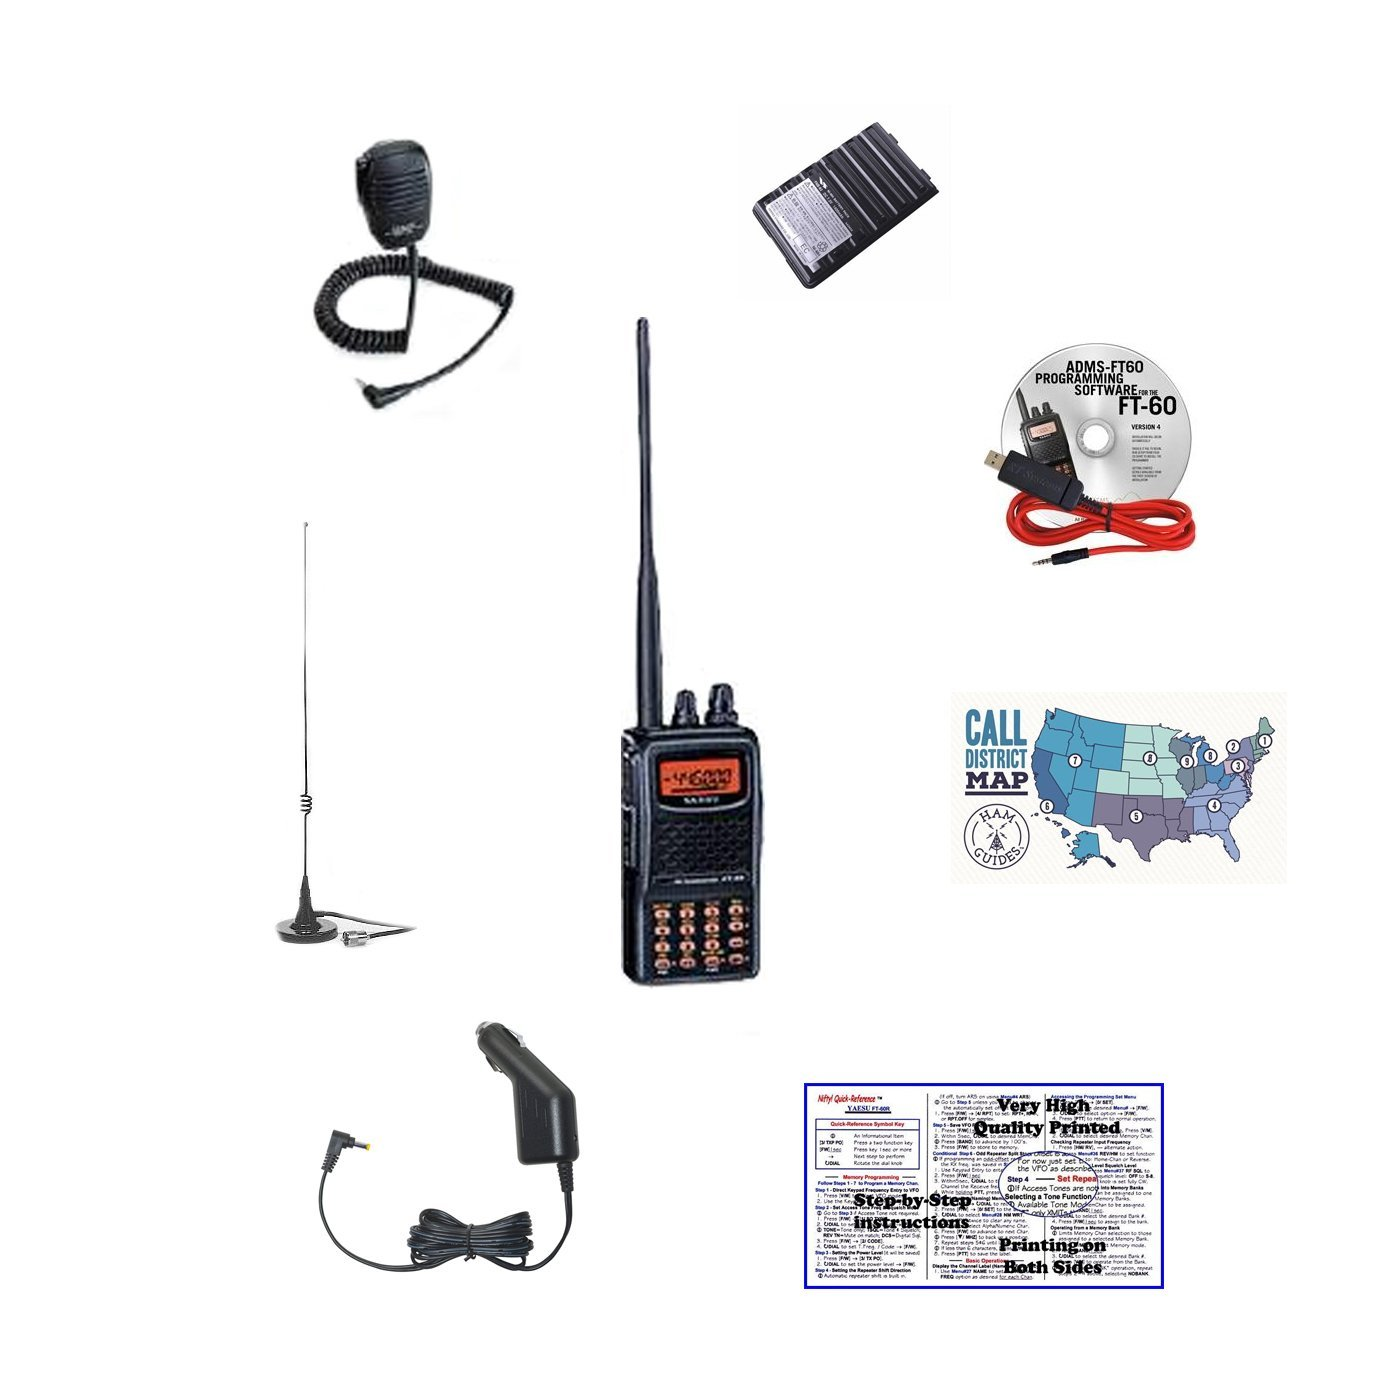 Yaesu FT-60R Handheld Radio /& Nifty Quick Reference Tri-Fold Guide Bundle!